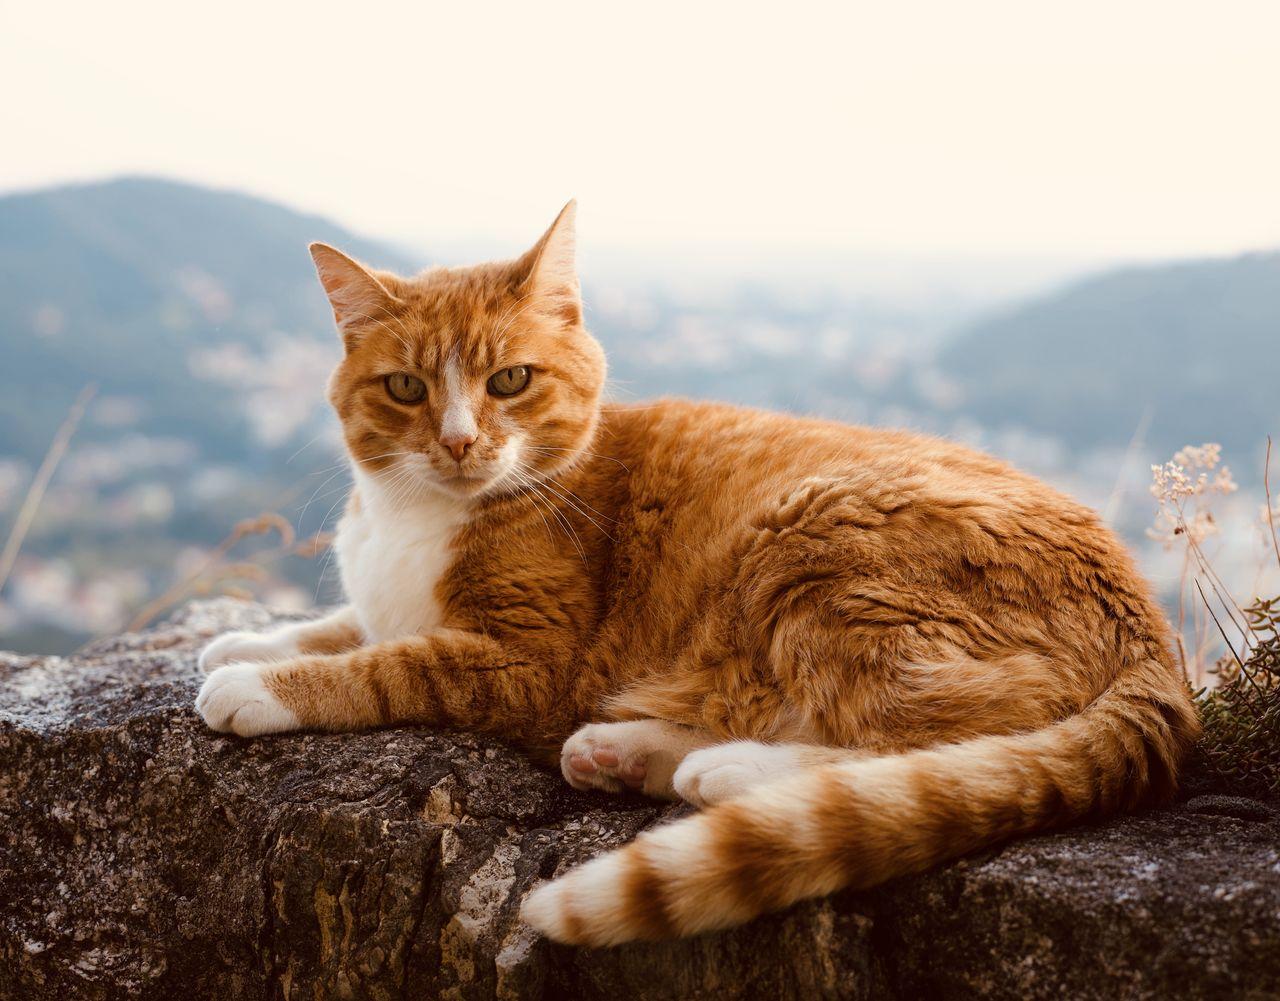 Cat lying on rock